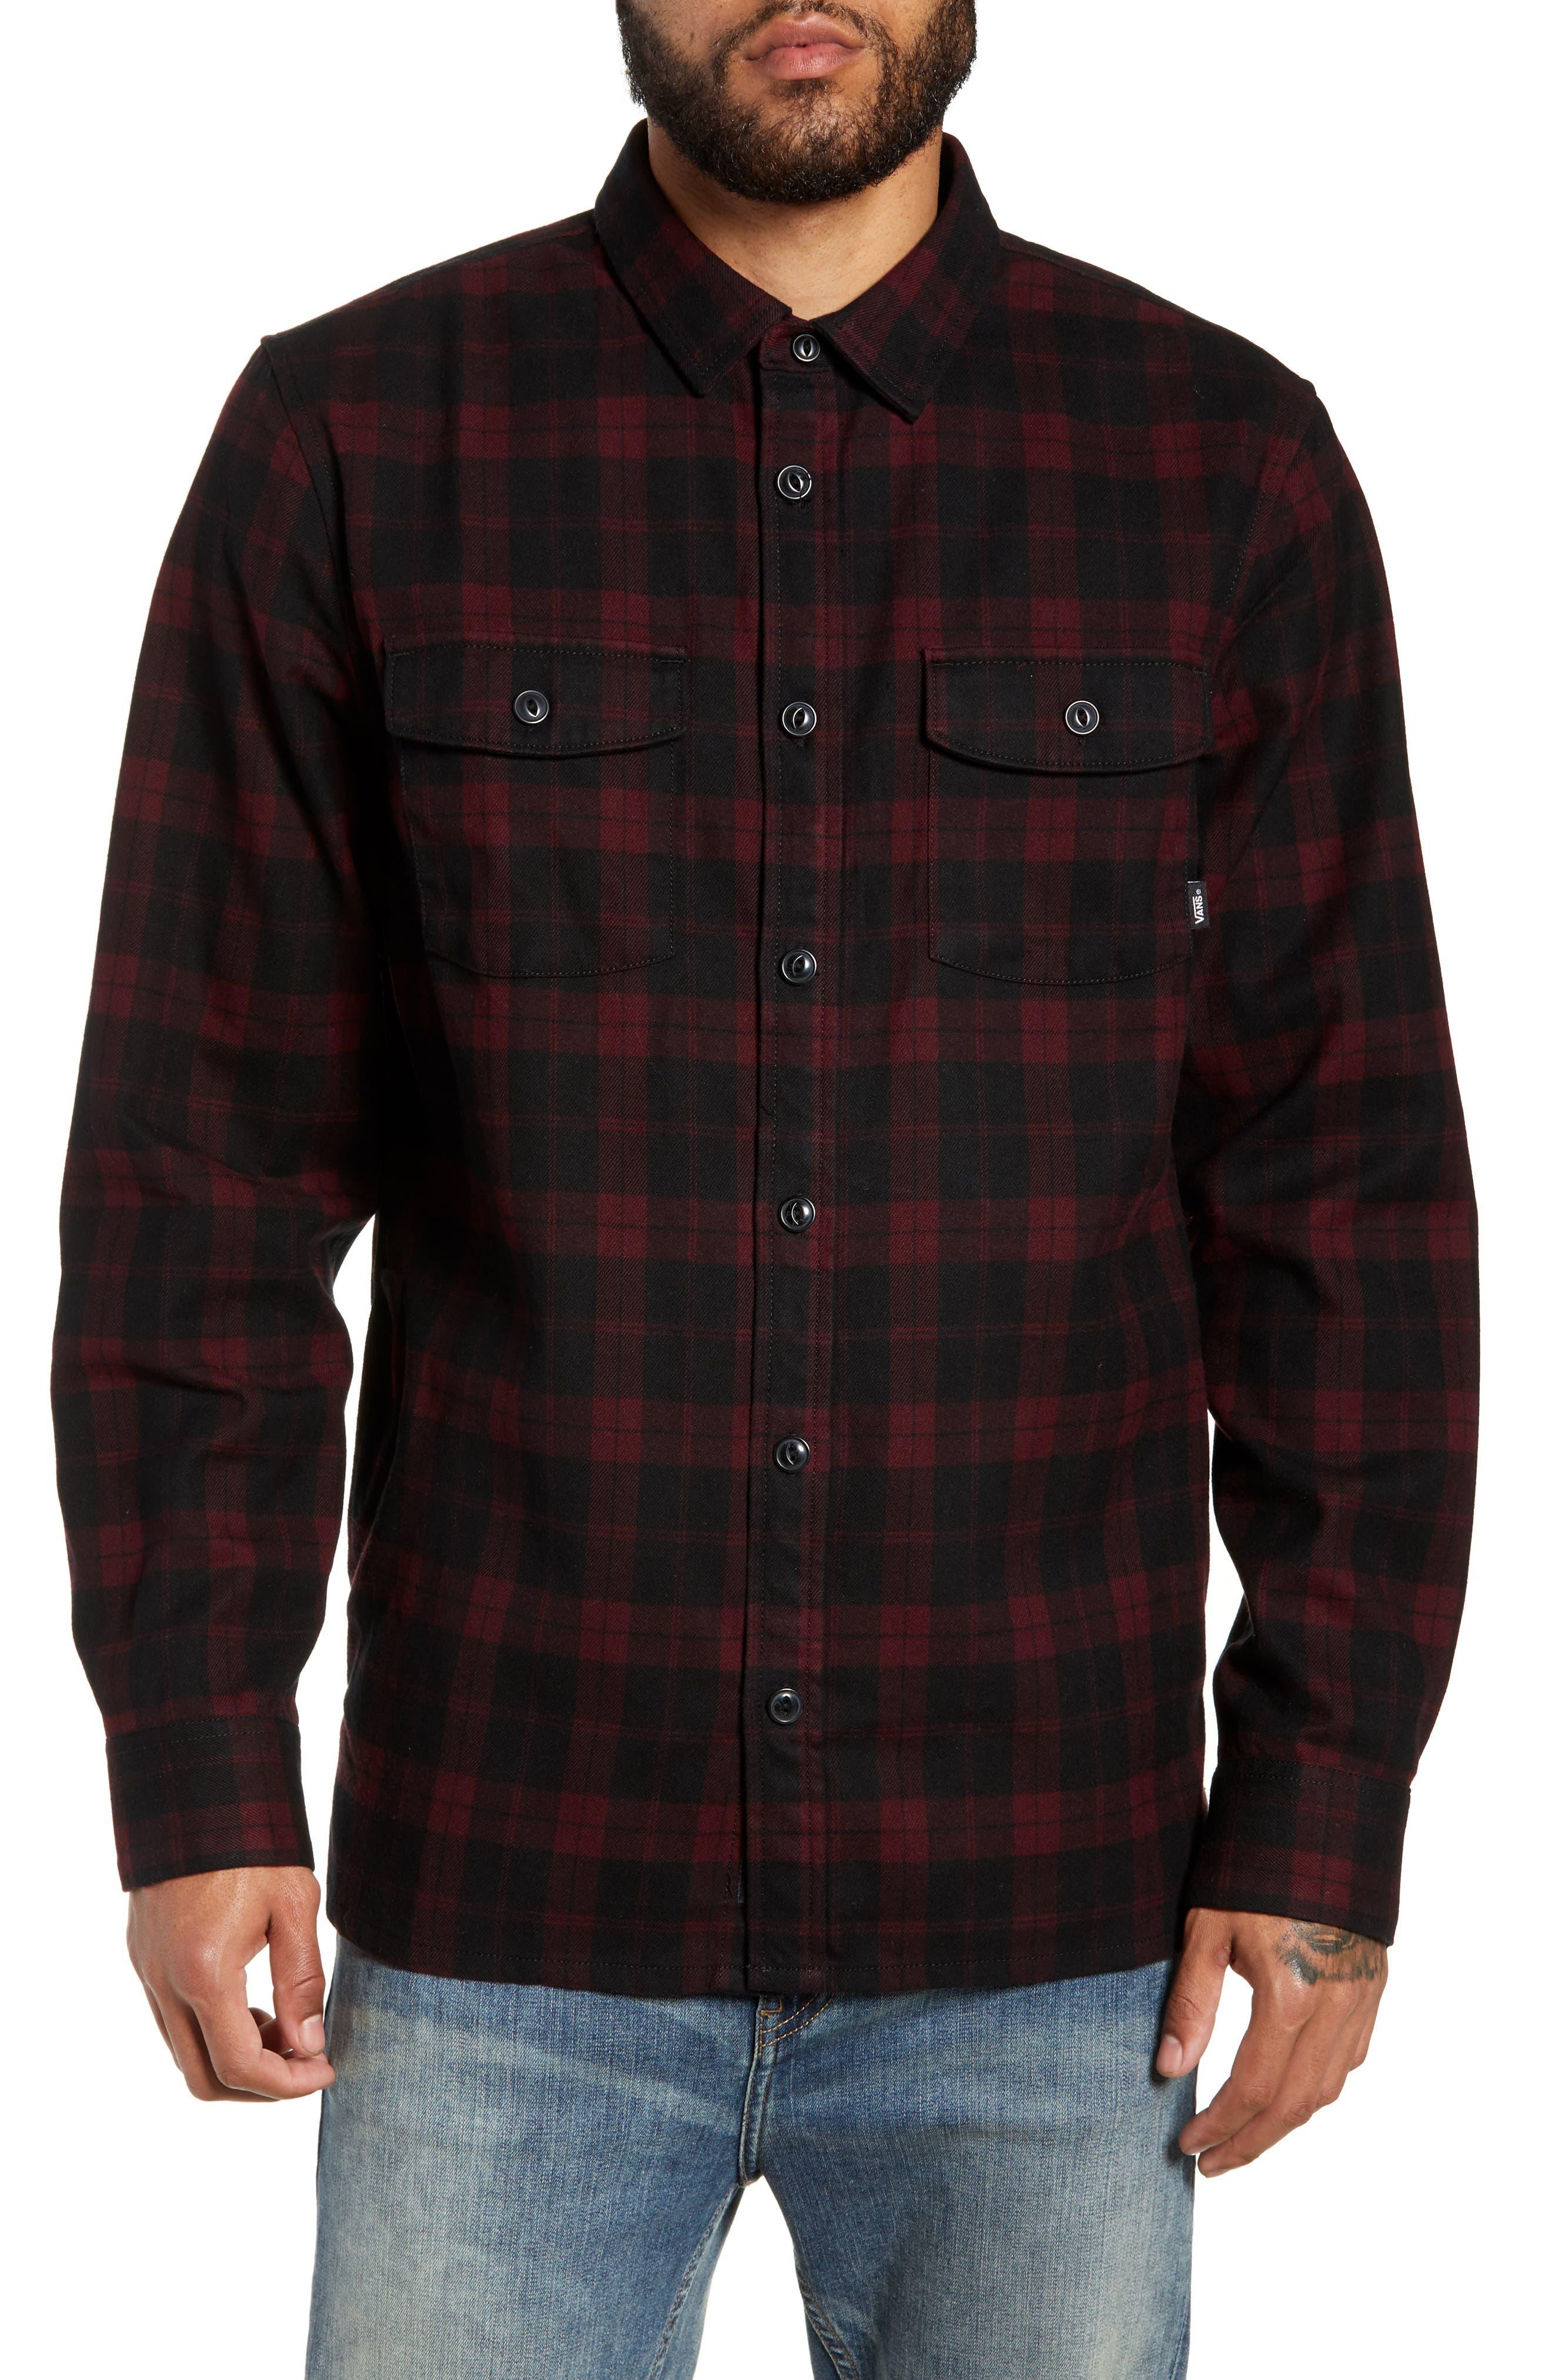 Vans Blackstone Plaid Flannel Shirt, Burgundy